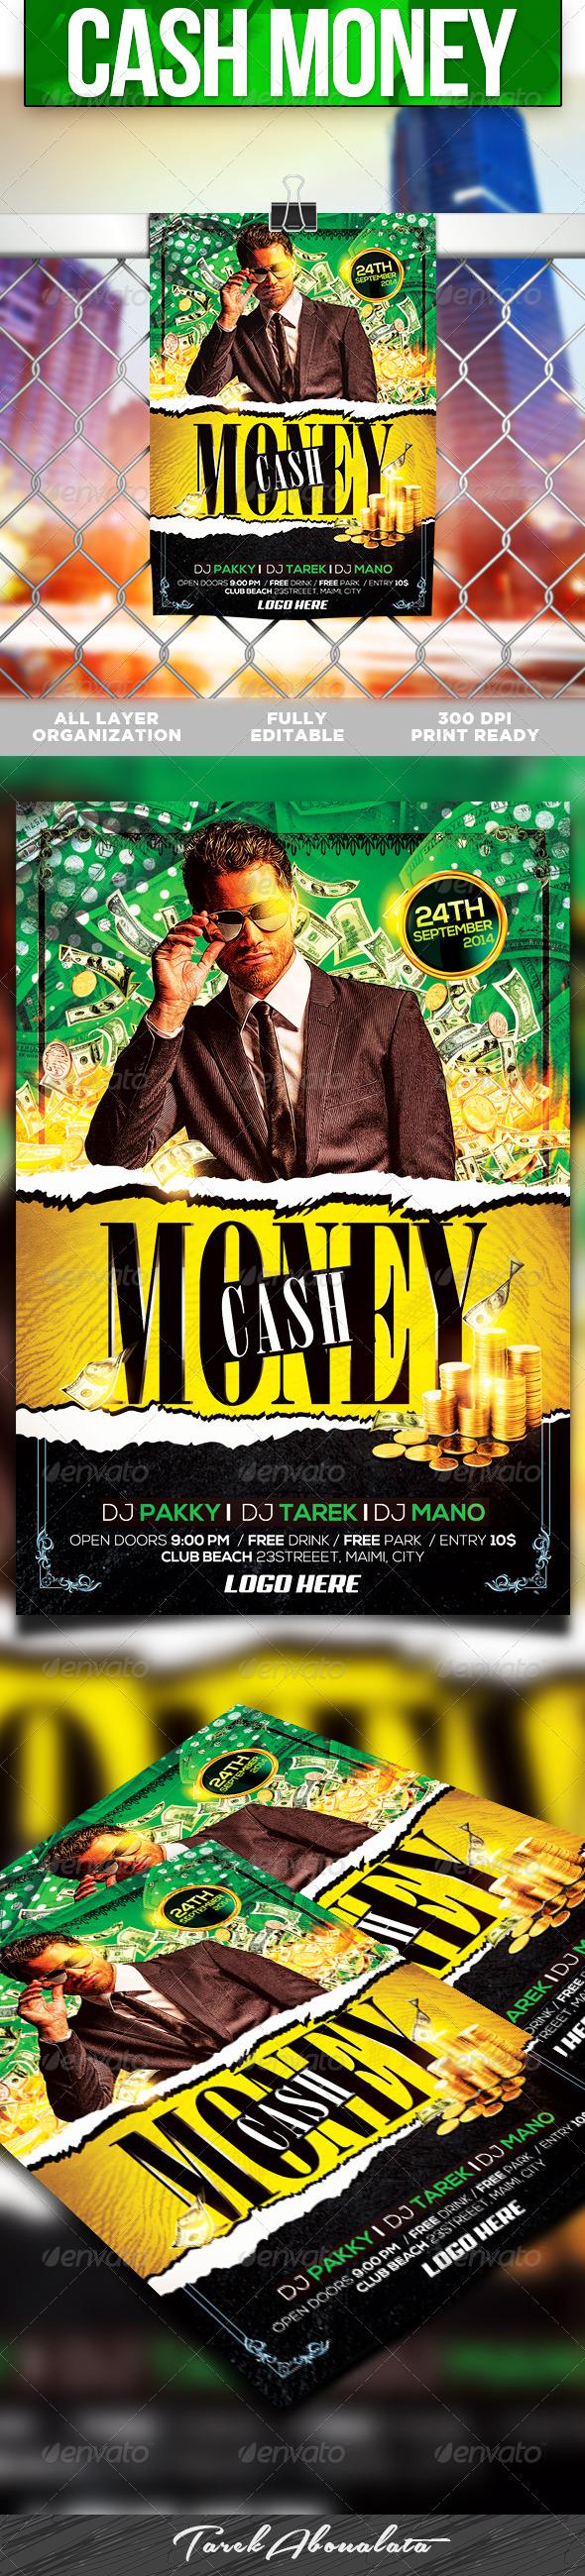 Cash Money Flyer Template V Fontslogosicons Pinterest Cash - Money flyer template